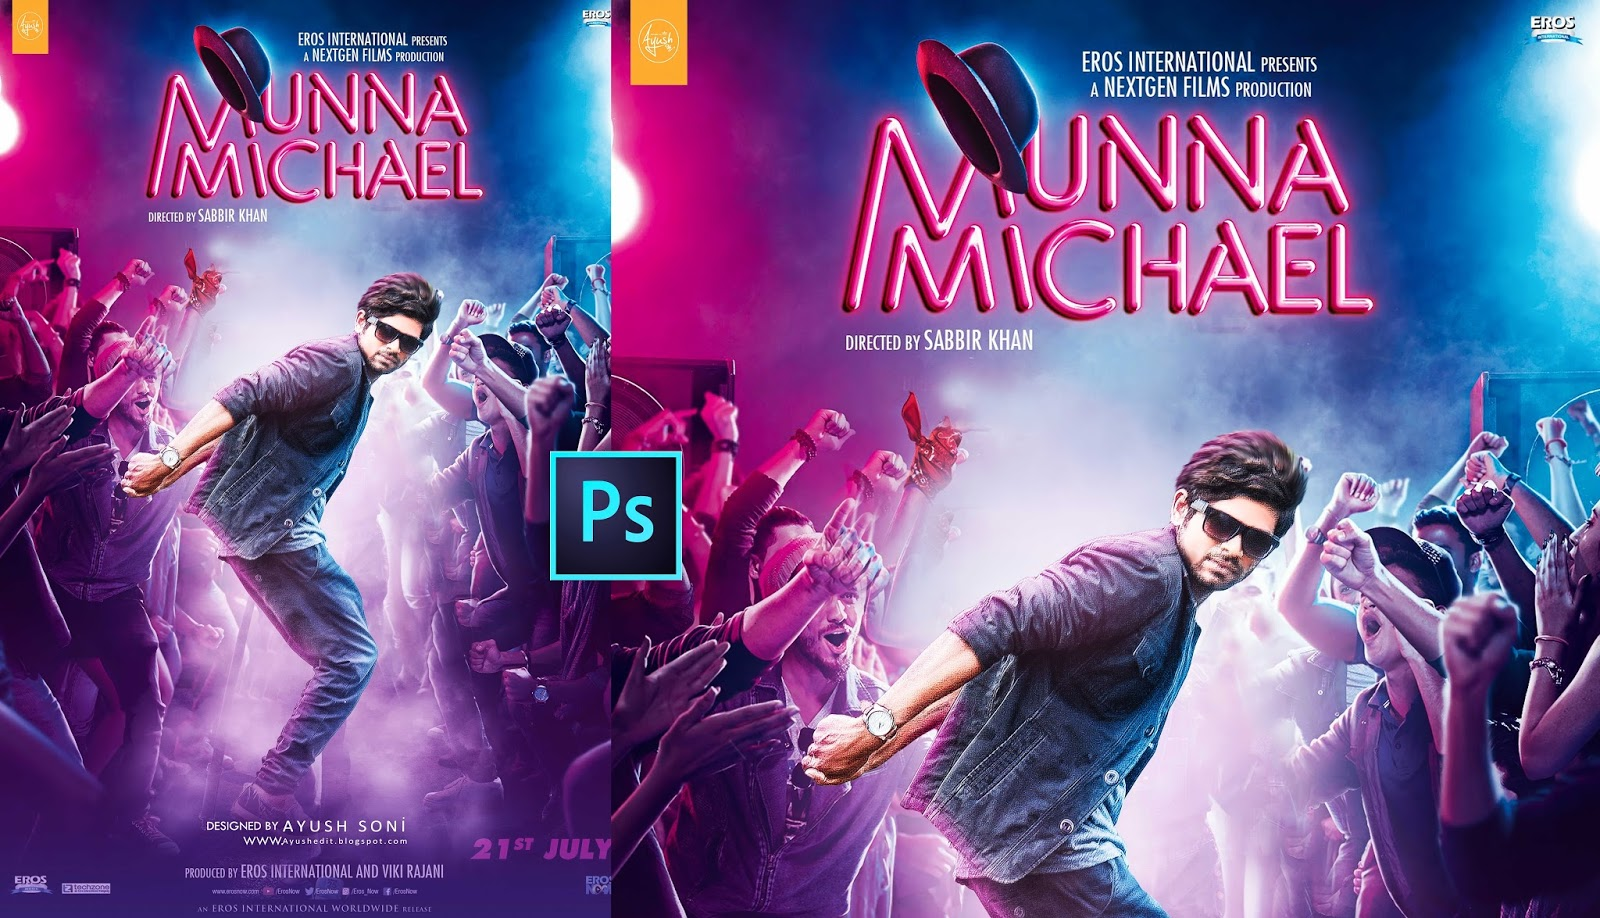 Munna michael movie poster design in photoshop tutorial ayush creation munna michael movie poster design in photoshop tutorial baditri Gallery